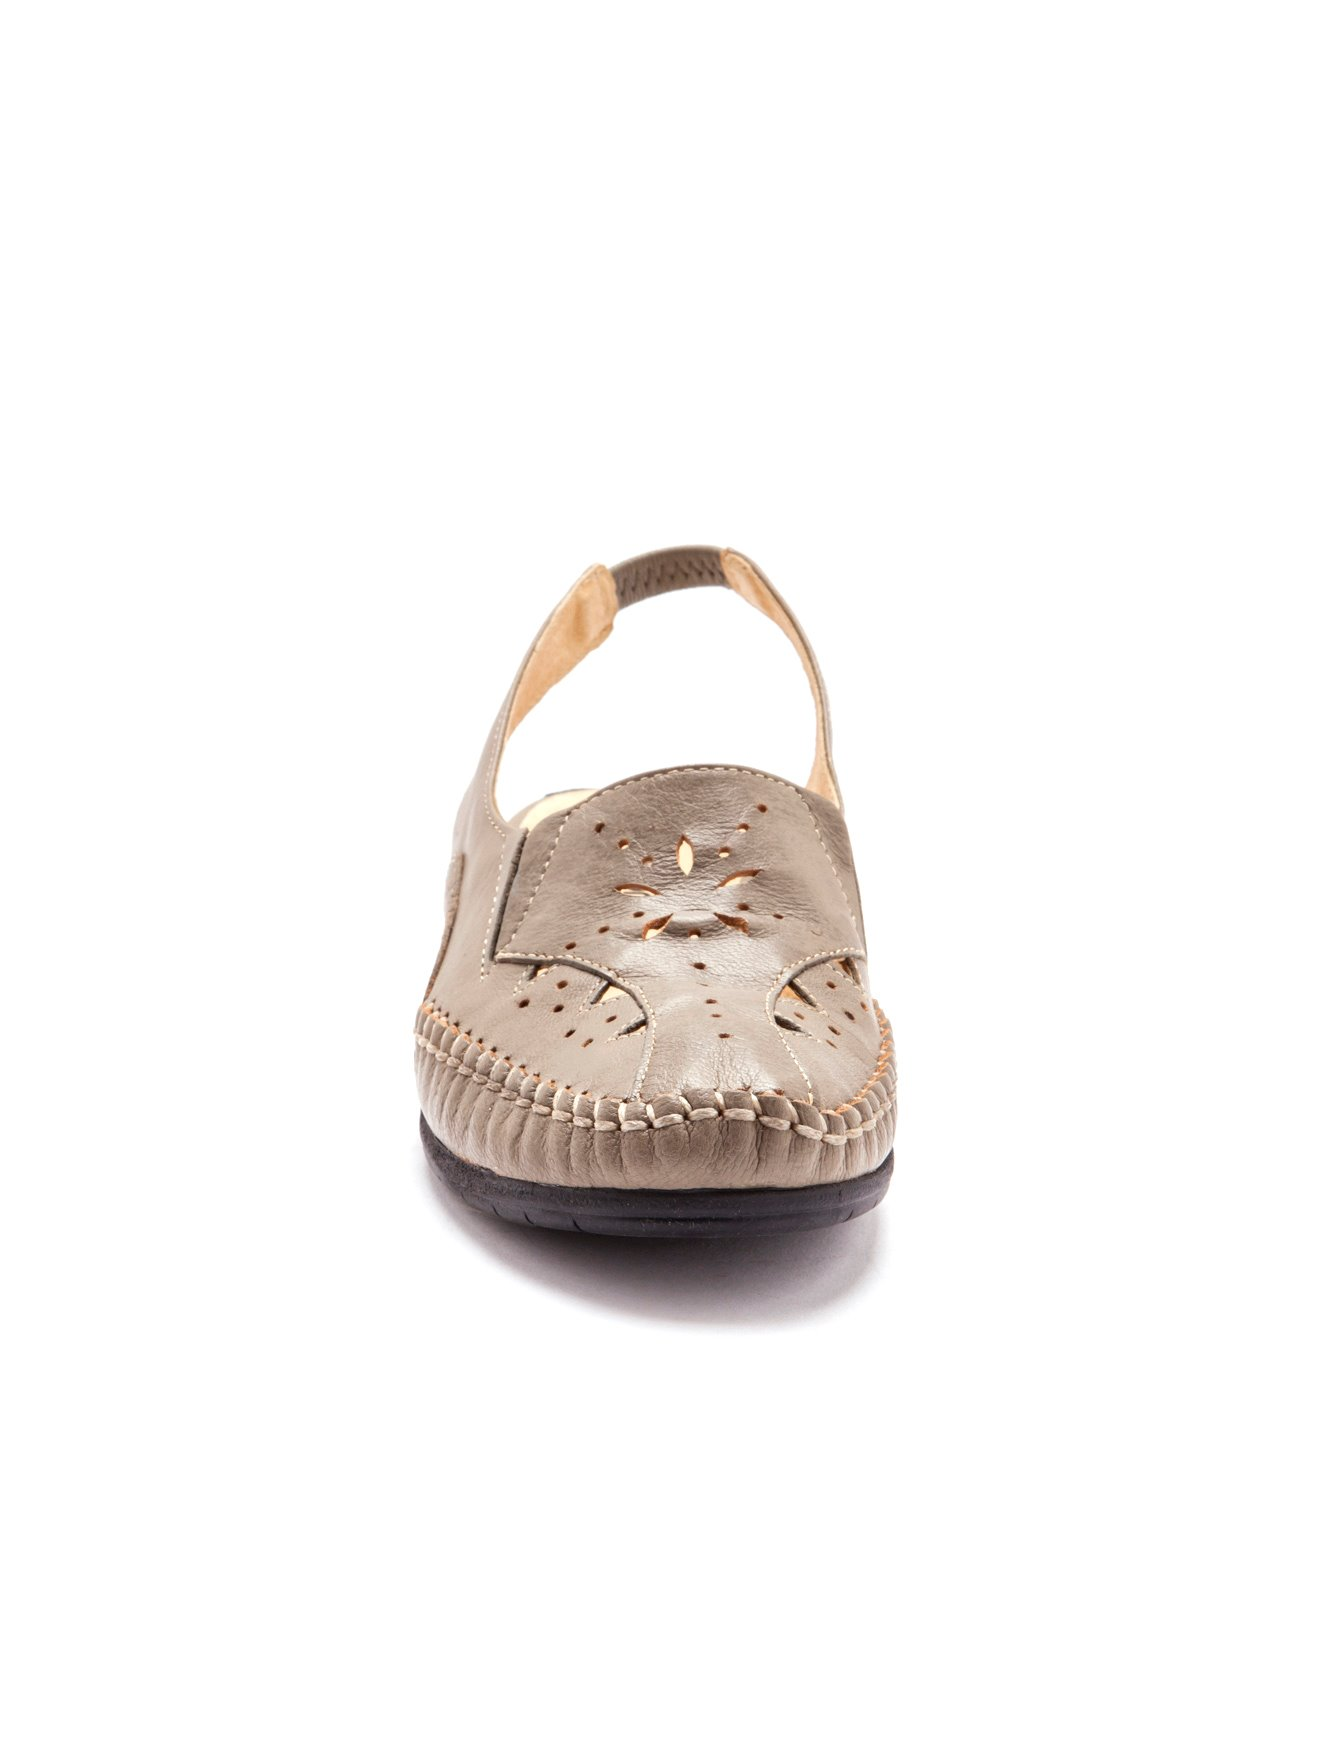 Sandales 4cm Ajouré Cuir Balsamik Talon yI7mY6gbfv